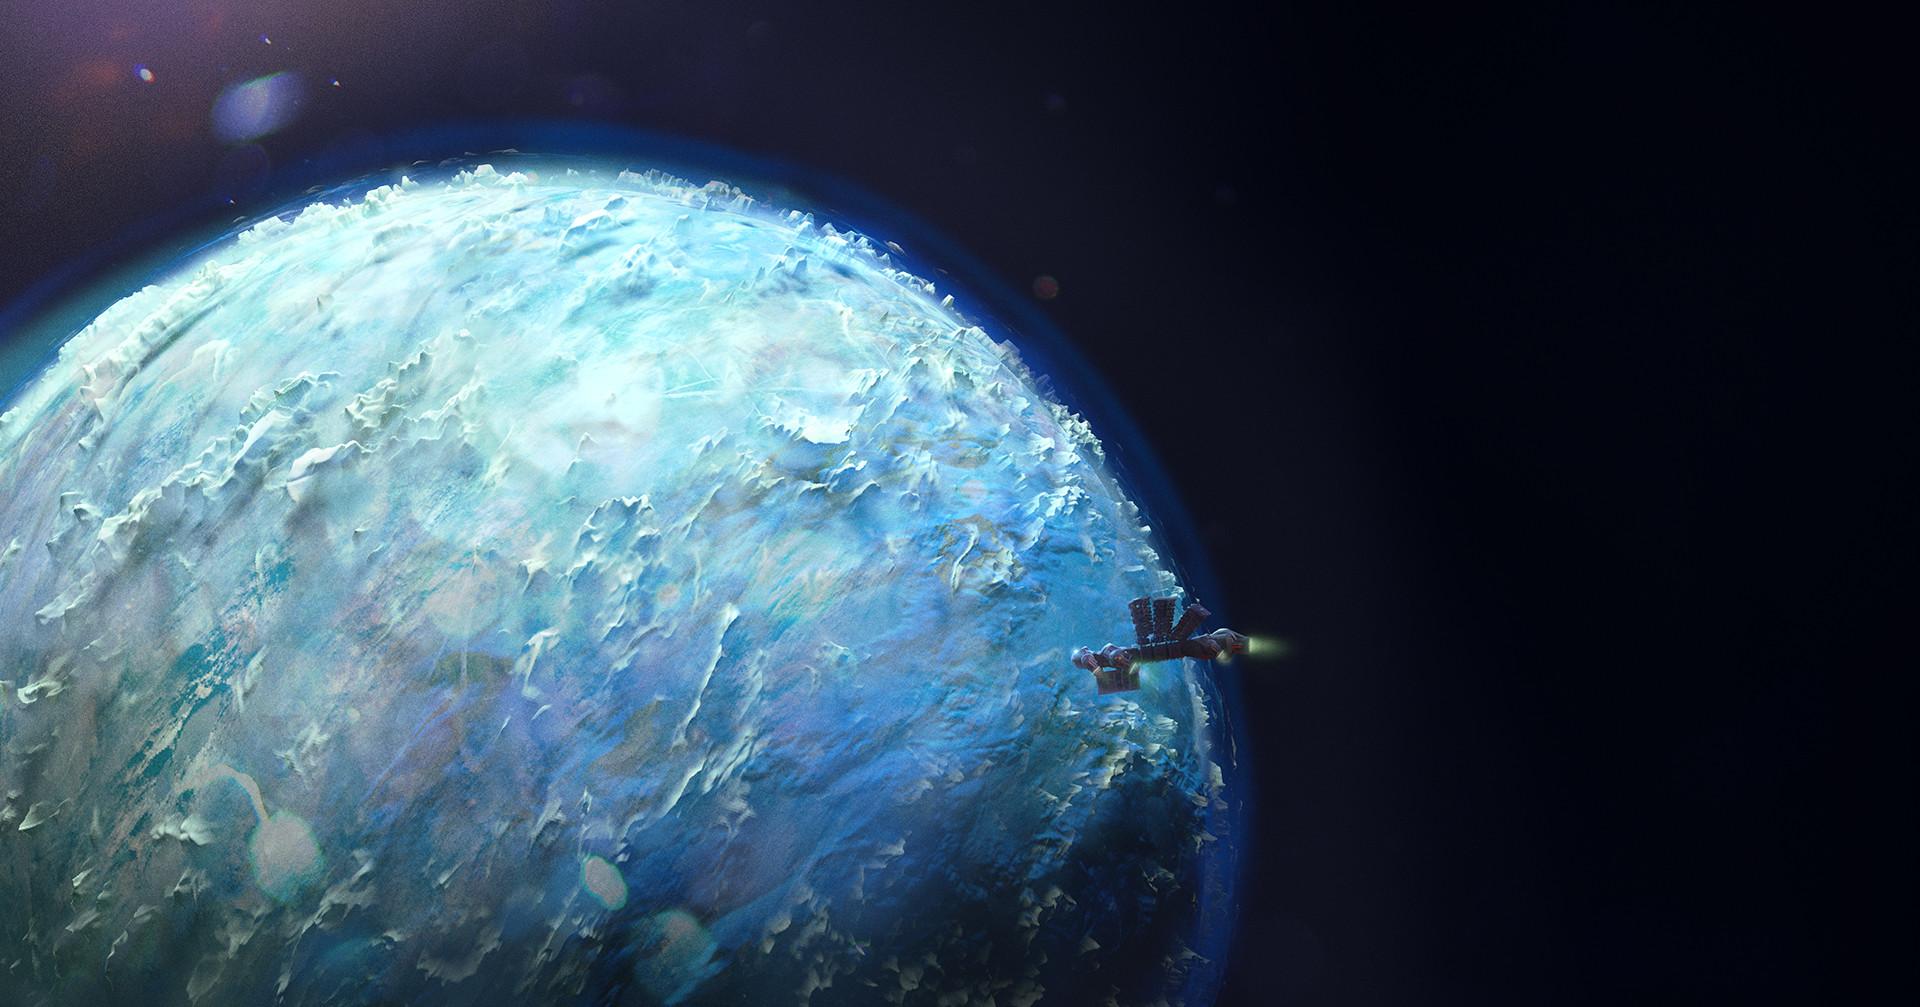 Alexandr iwaac exoplannet 1 low size